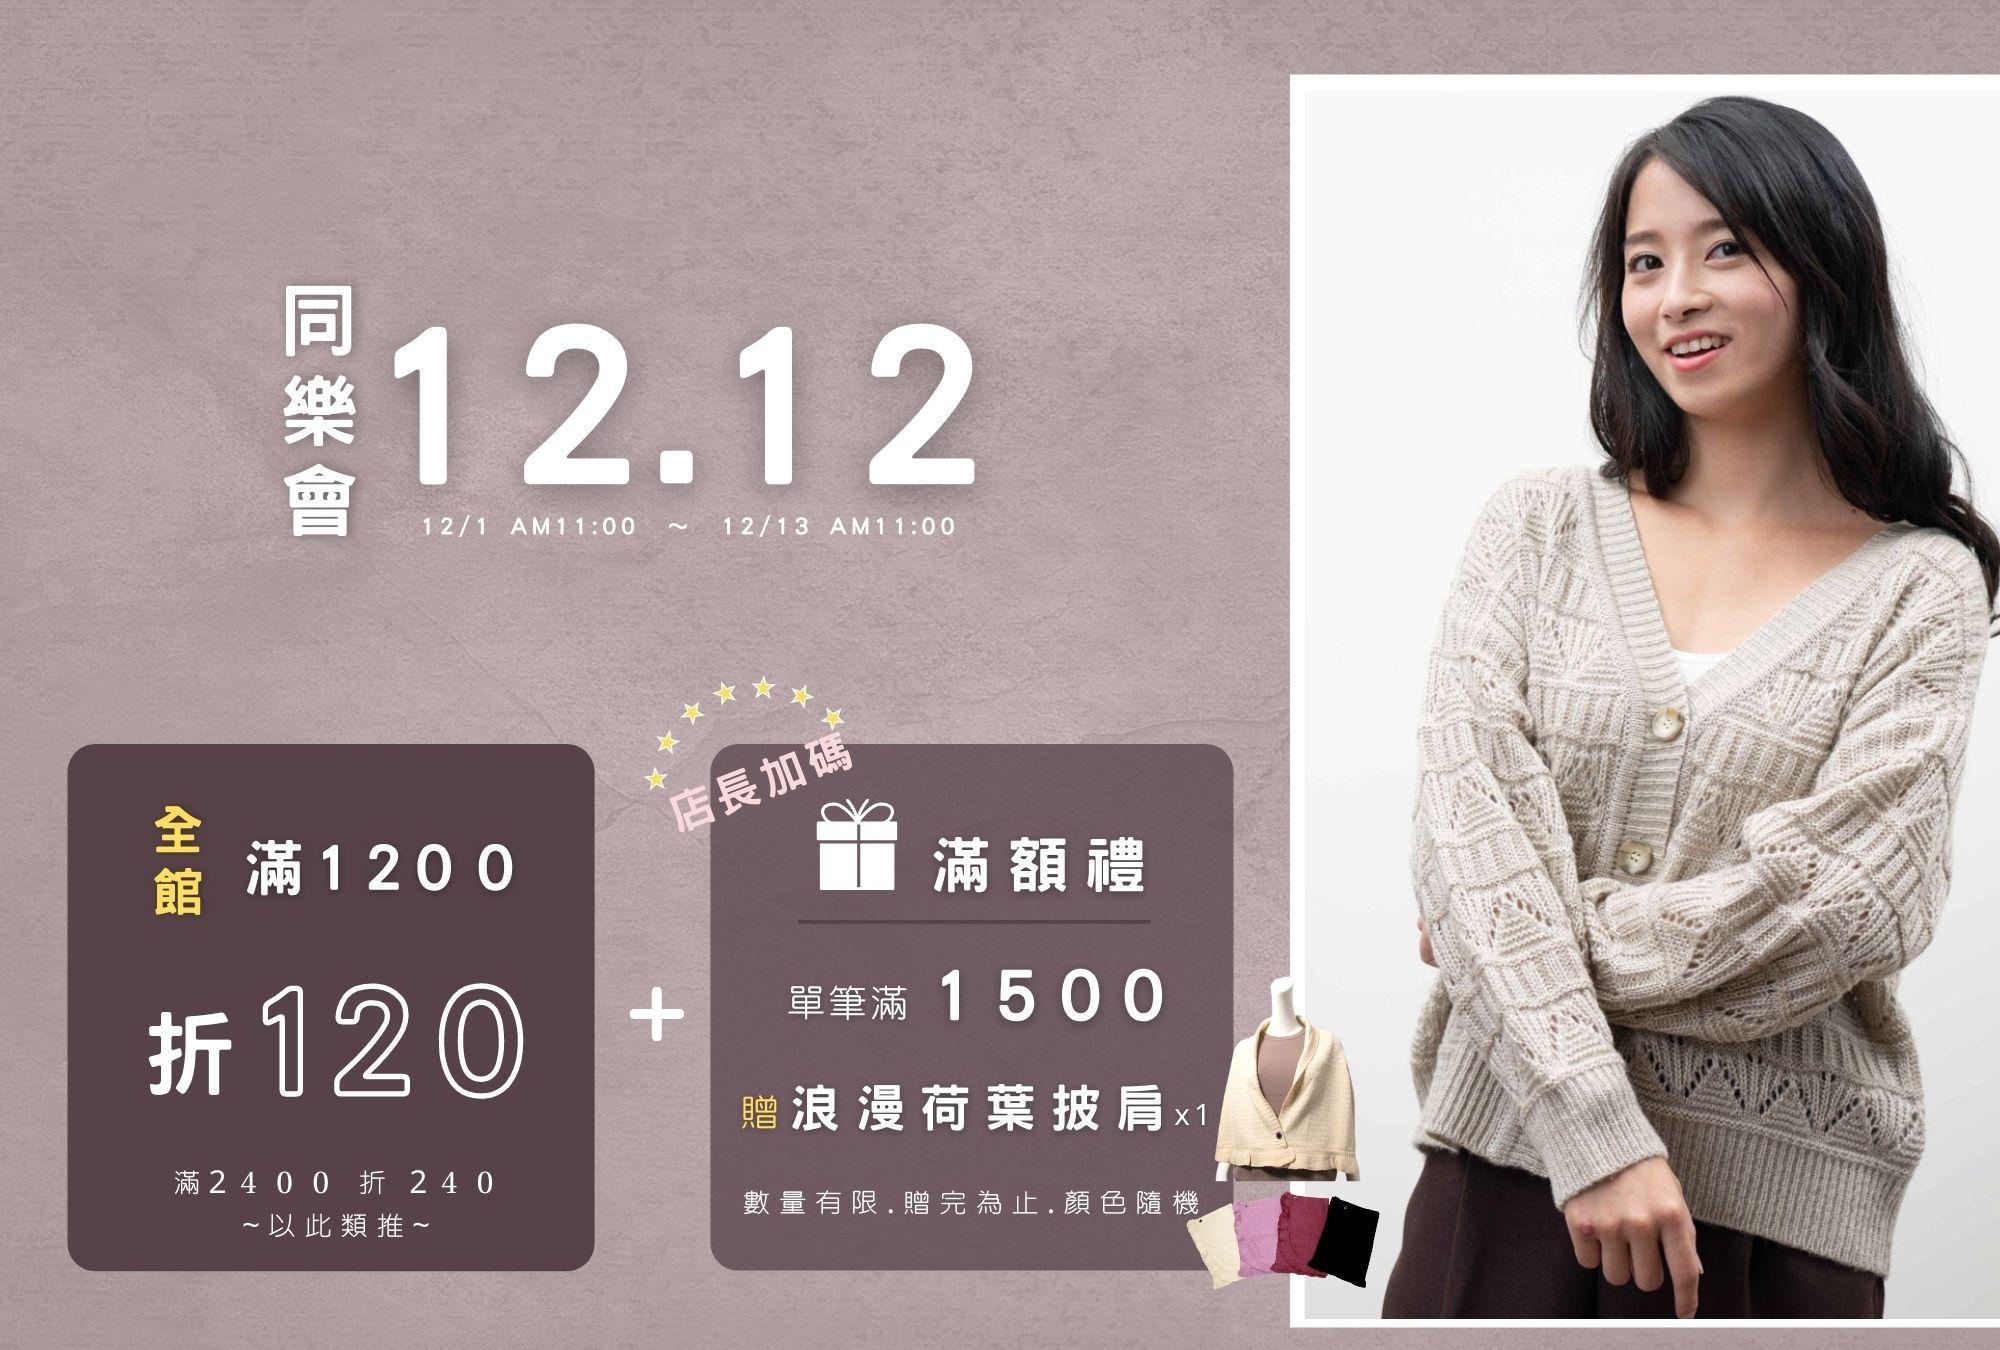 雙12 活動 | O-LIWAY 台灣製針織衫